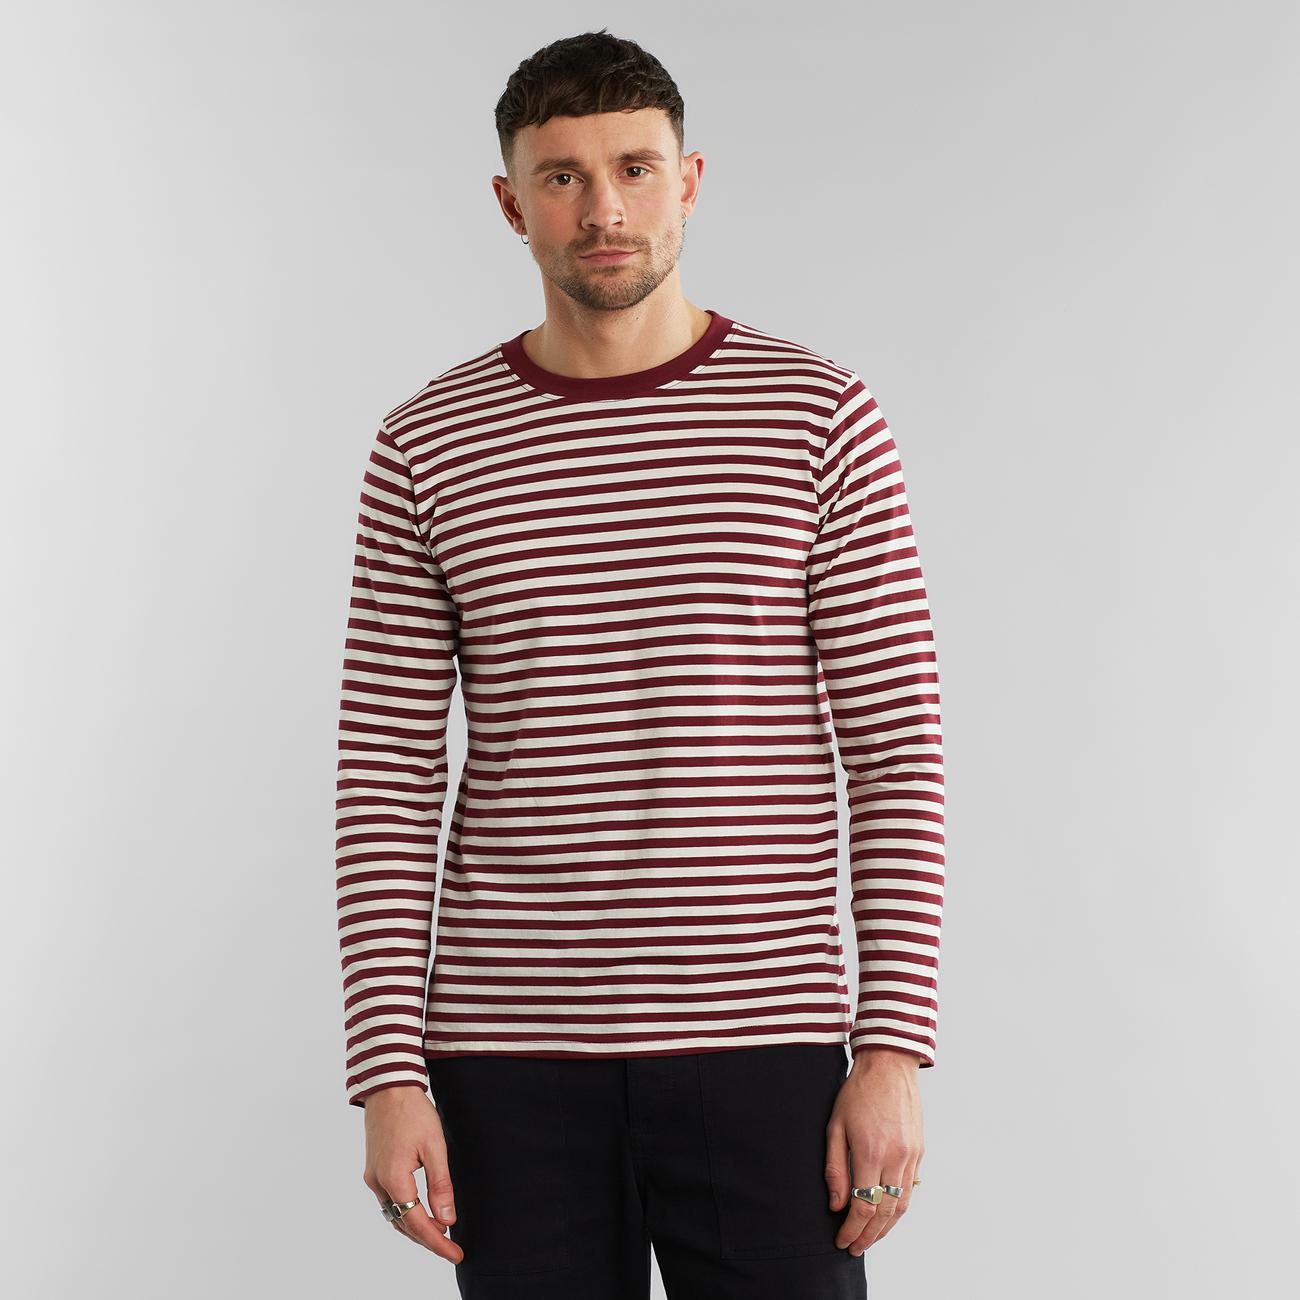 Long Sleeve T-shirt Hasle Stripes Burgundy